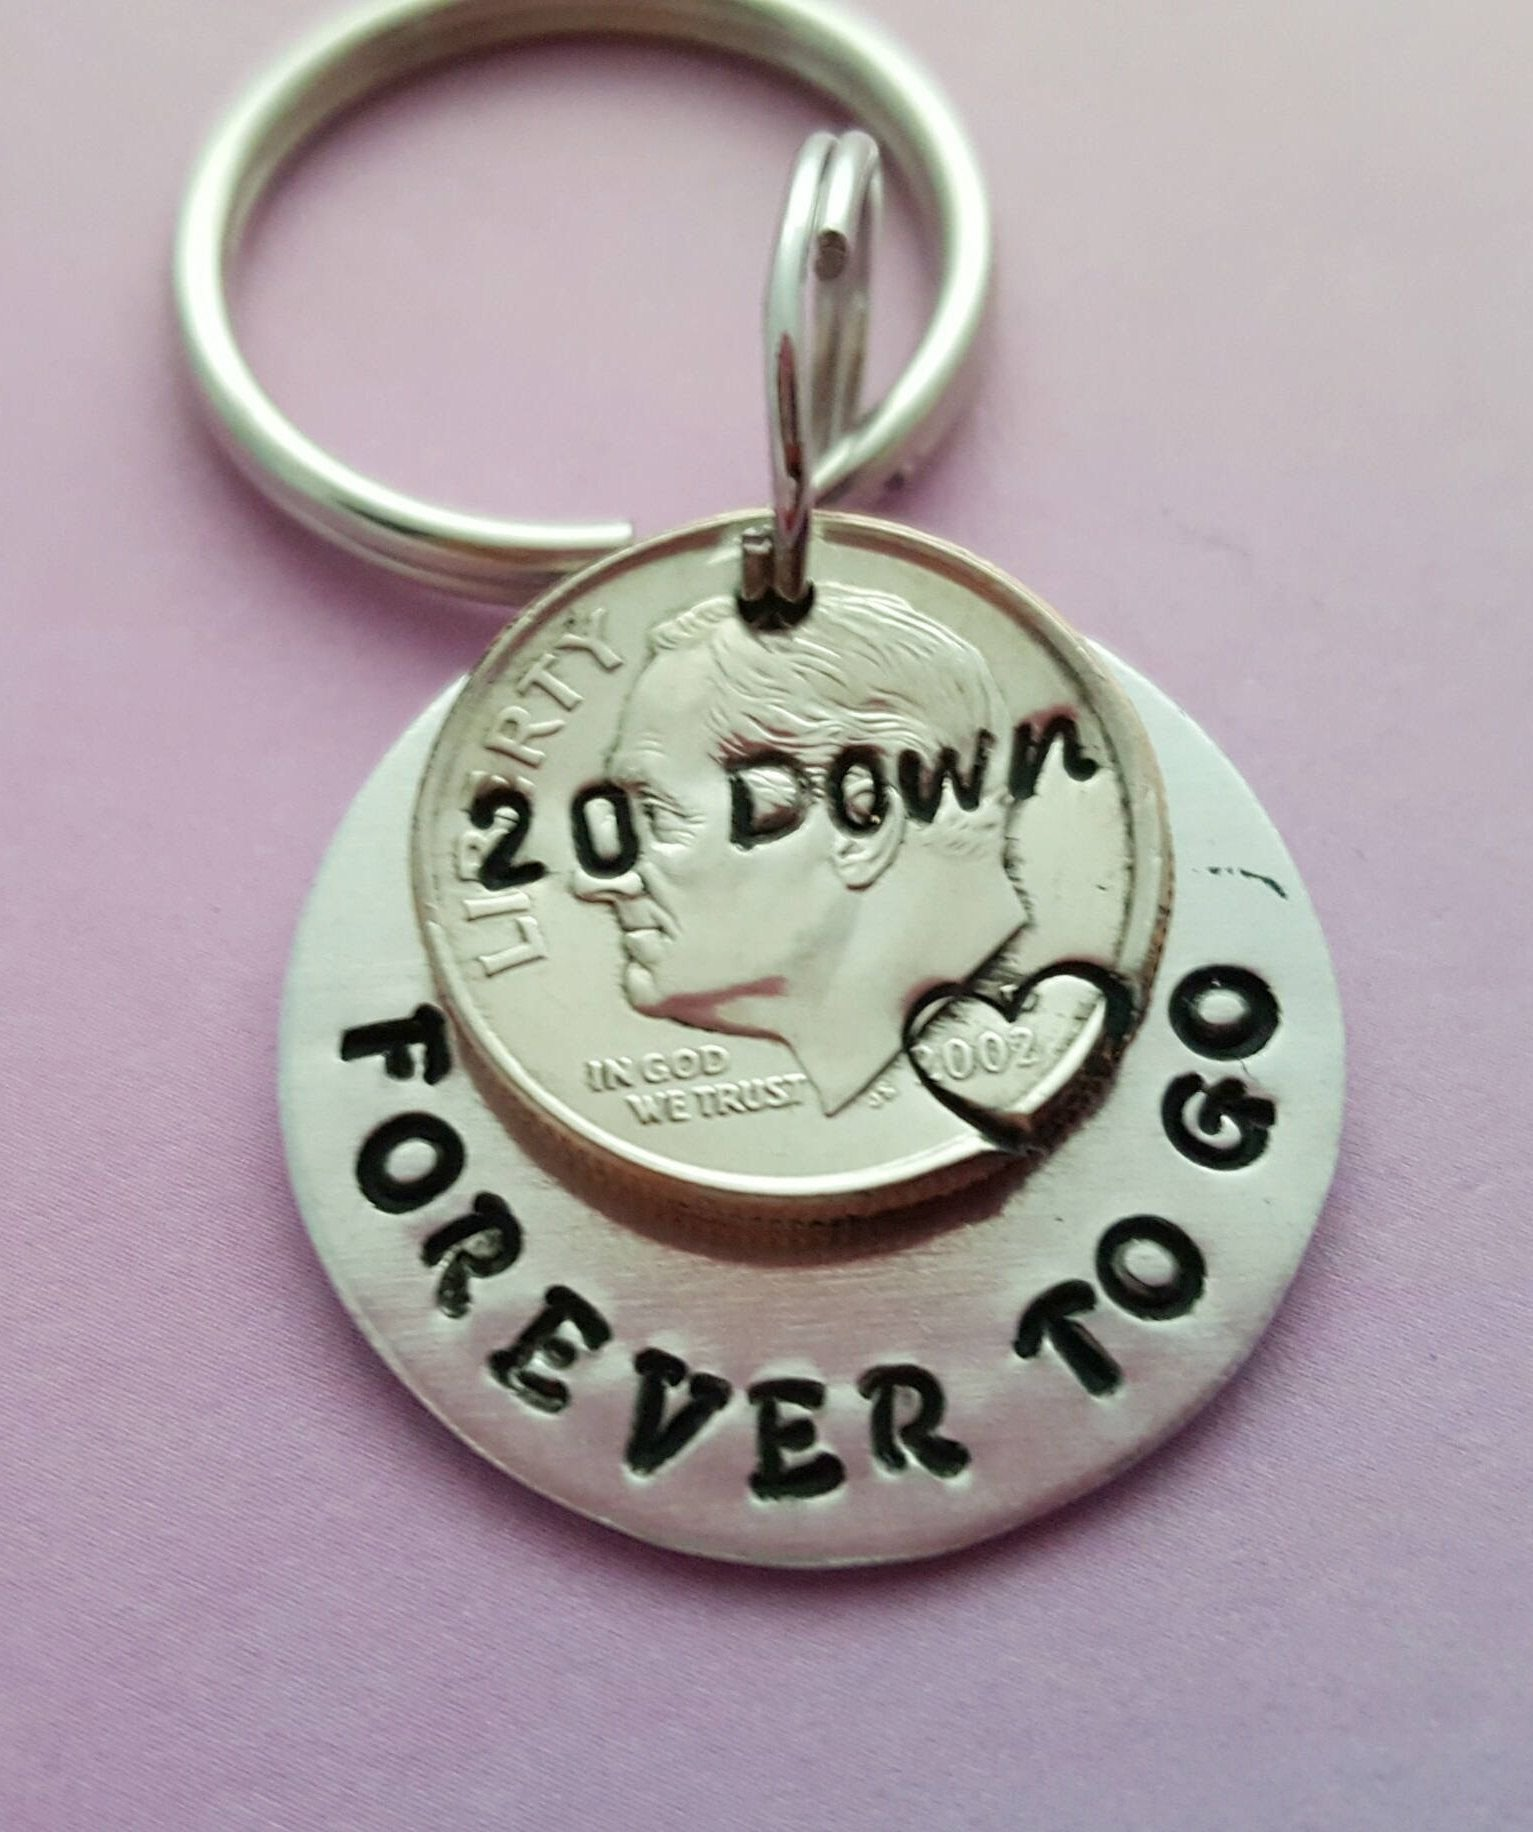 10 Stylish 20 Year Anniversary Gift Ideas 20th anniversary gift idea 20 year wedding anniversary keychain 4